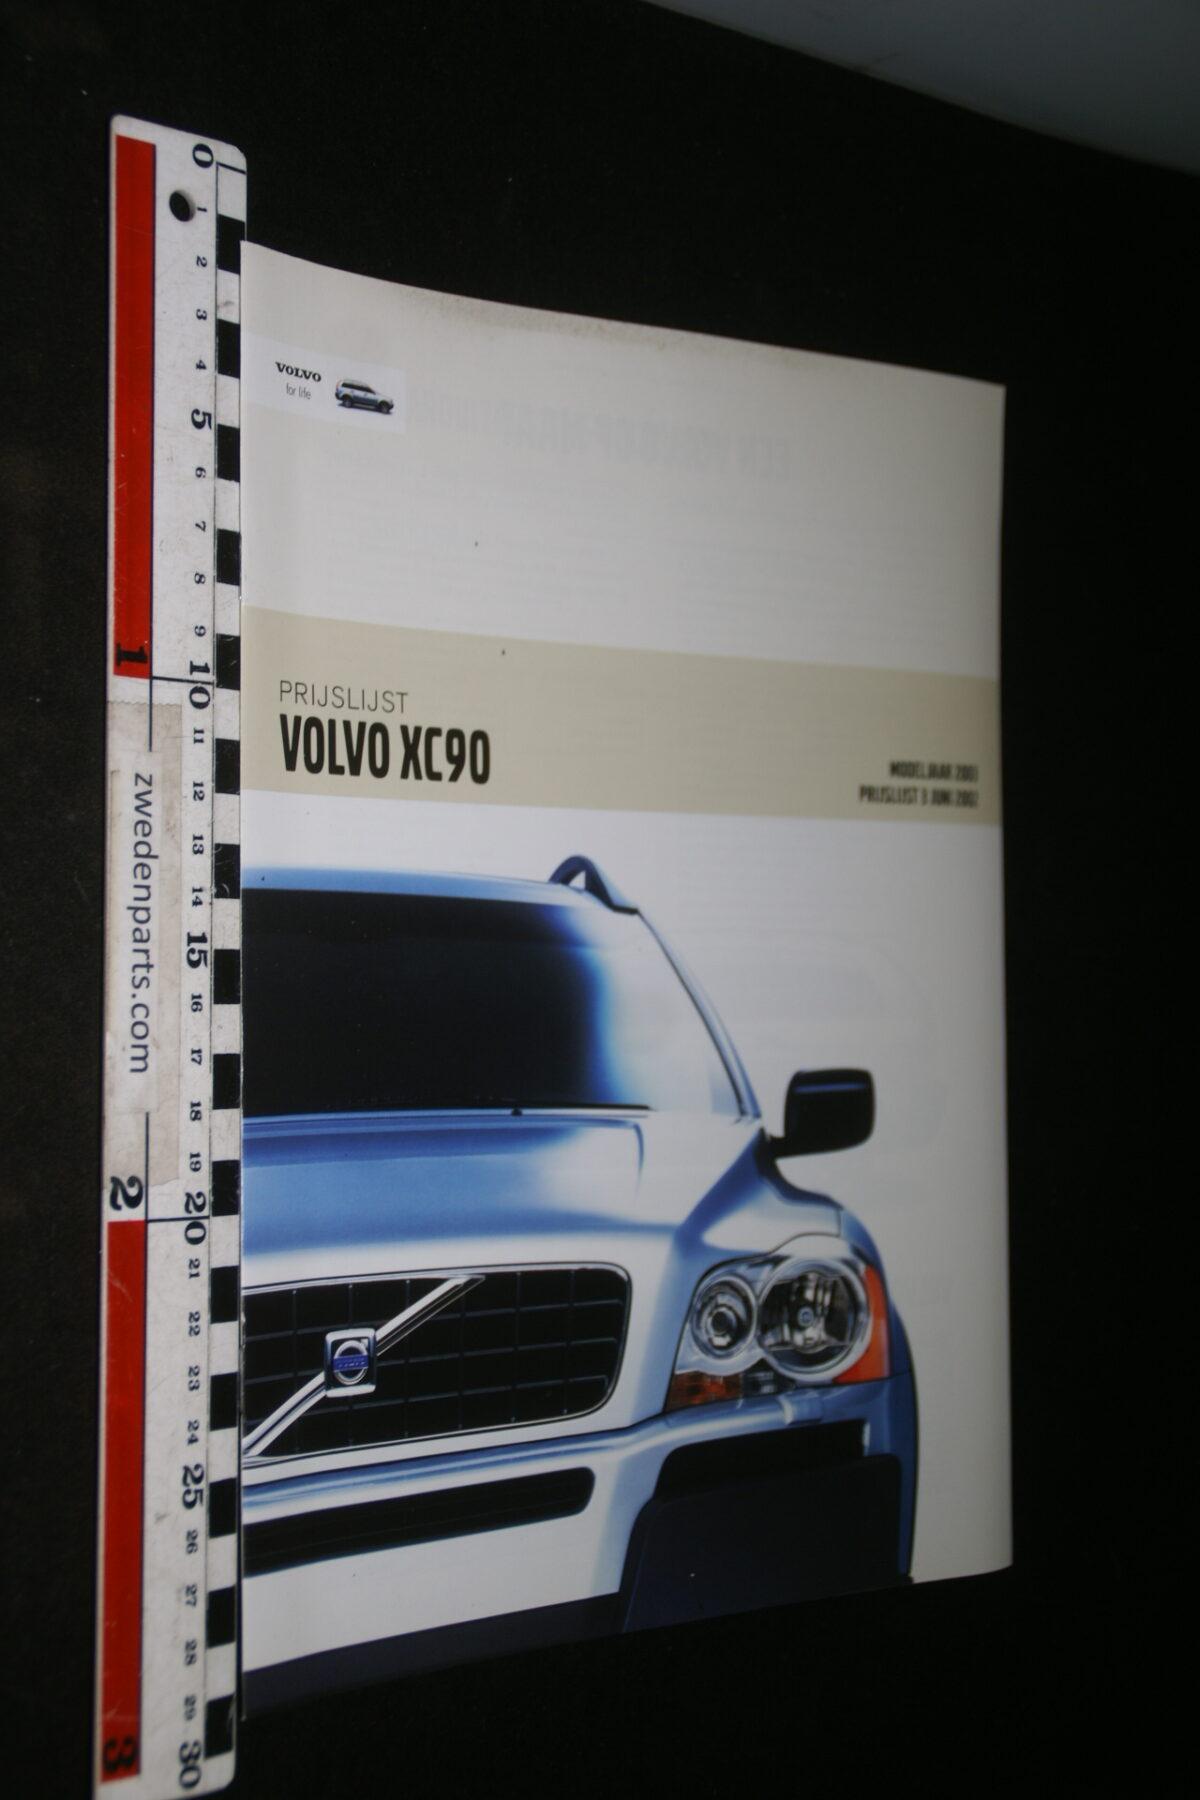 DSC04434 2003 brochure Volvo XC90 nr. MY 03 0503-220b2044